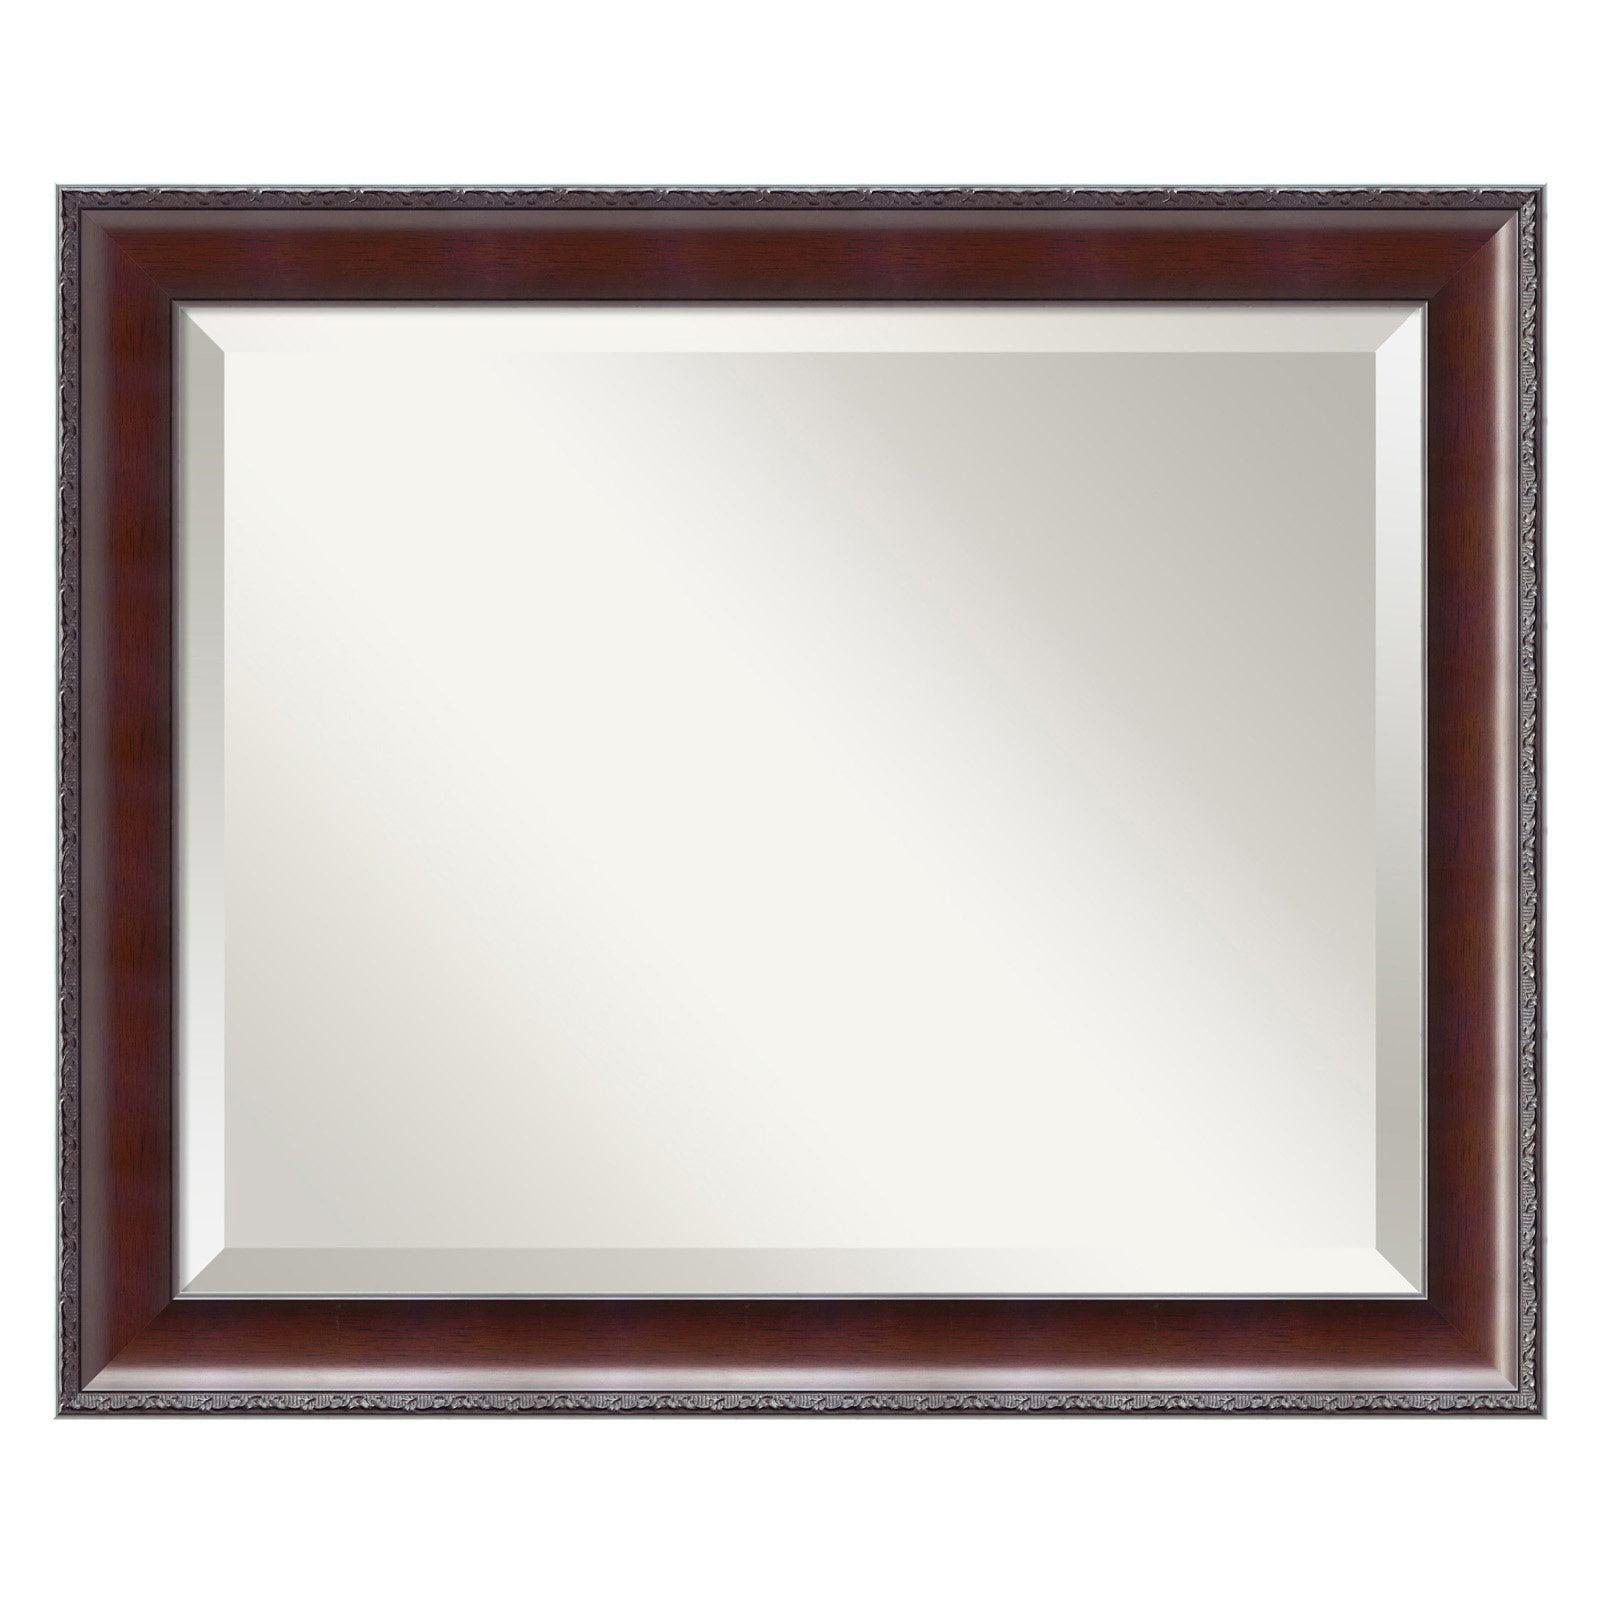 Country Walnut Wall Mirror - 23W x 20H in.